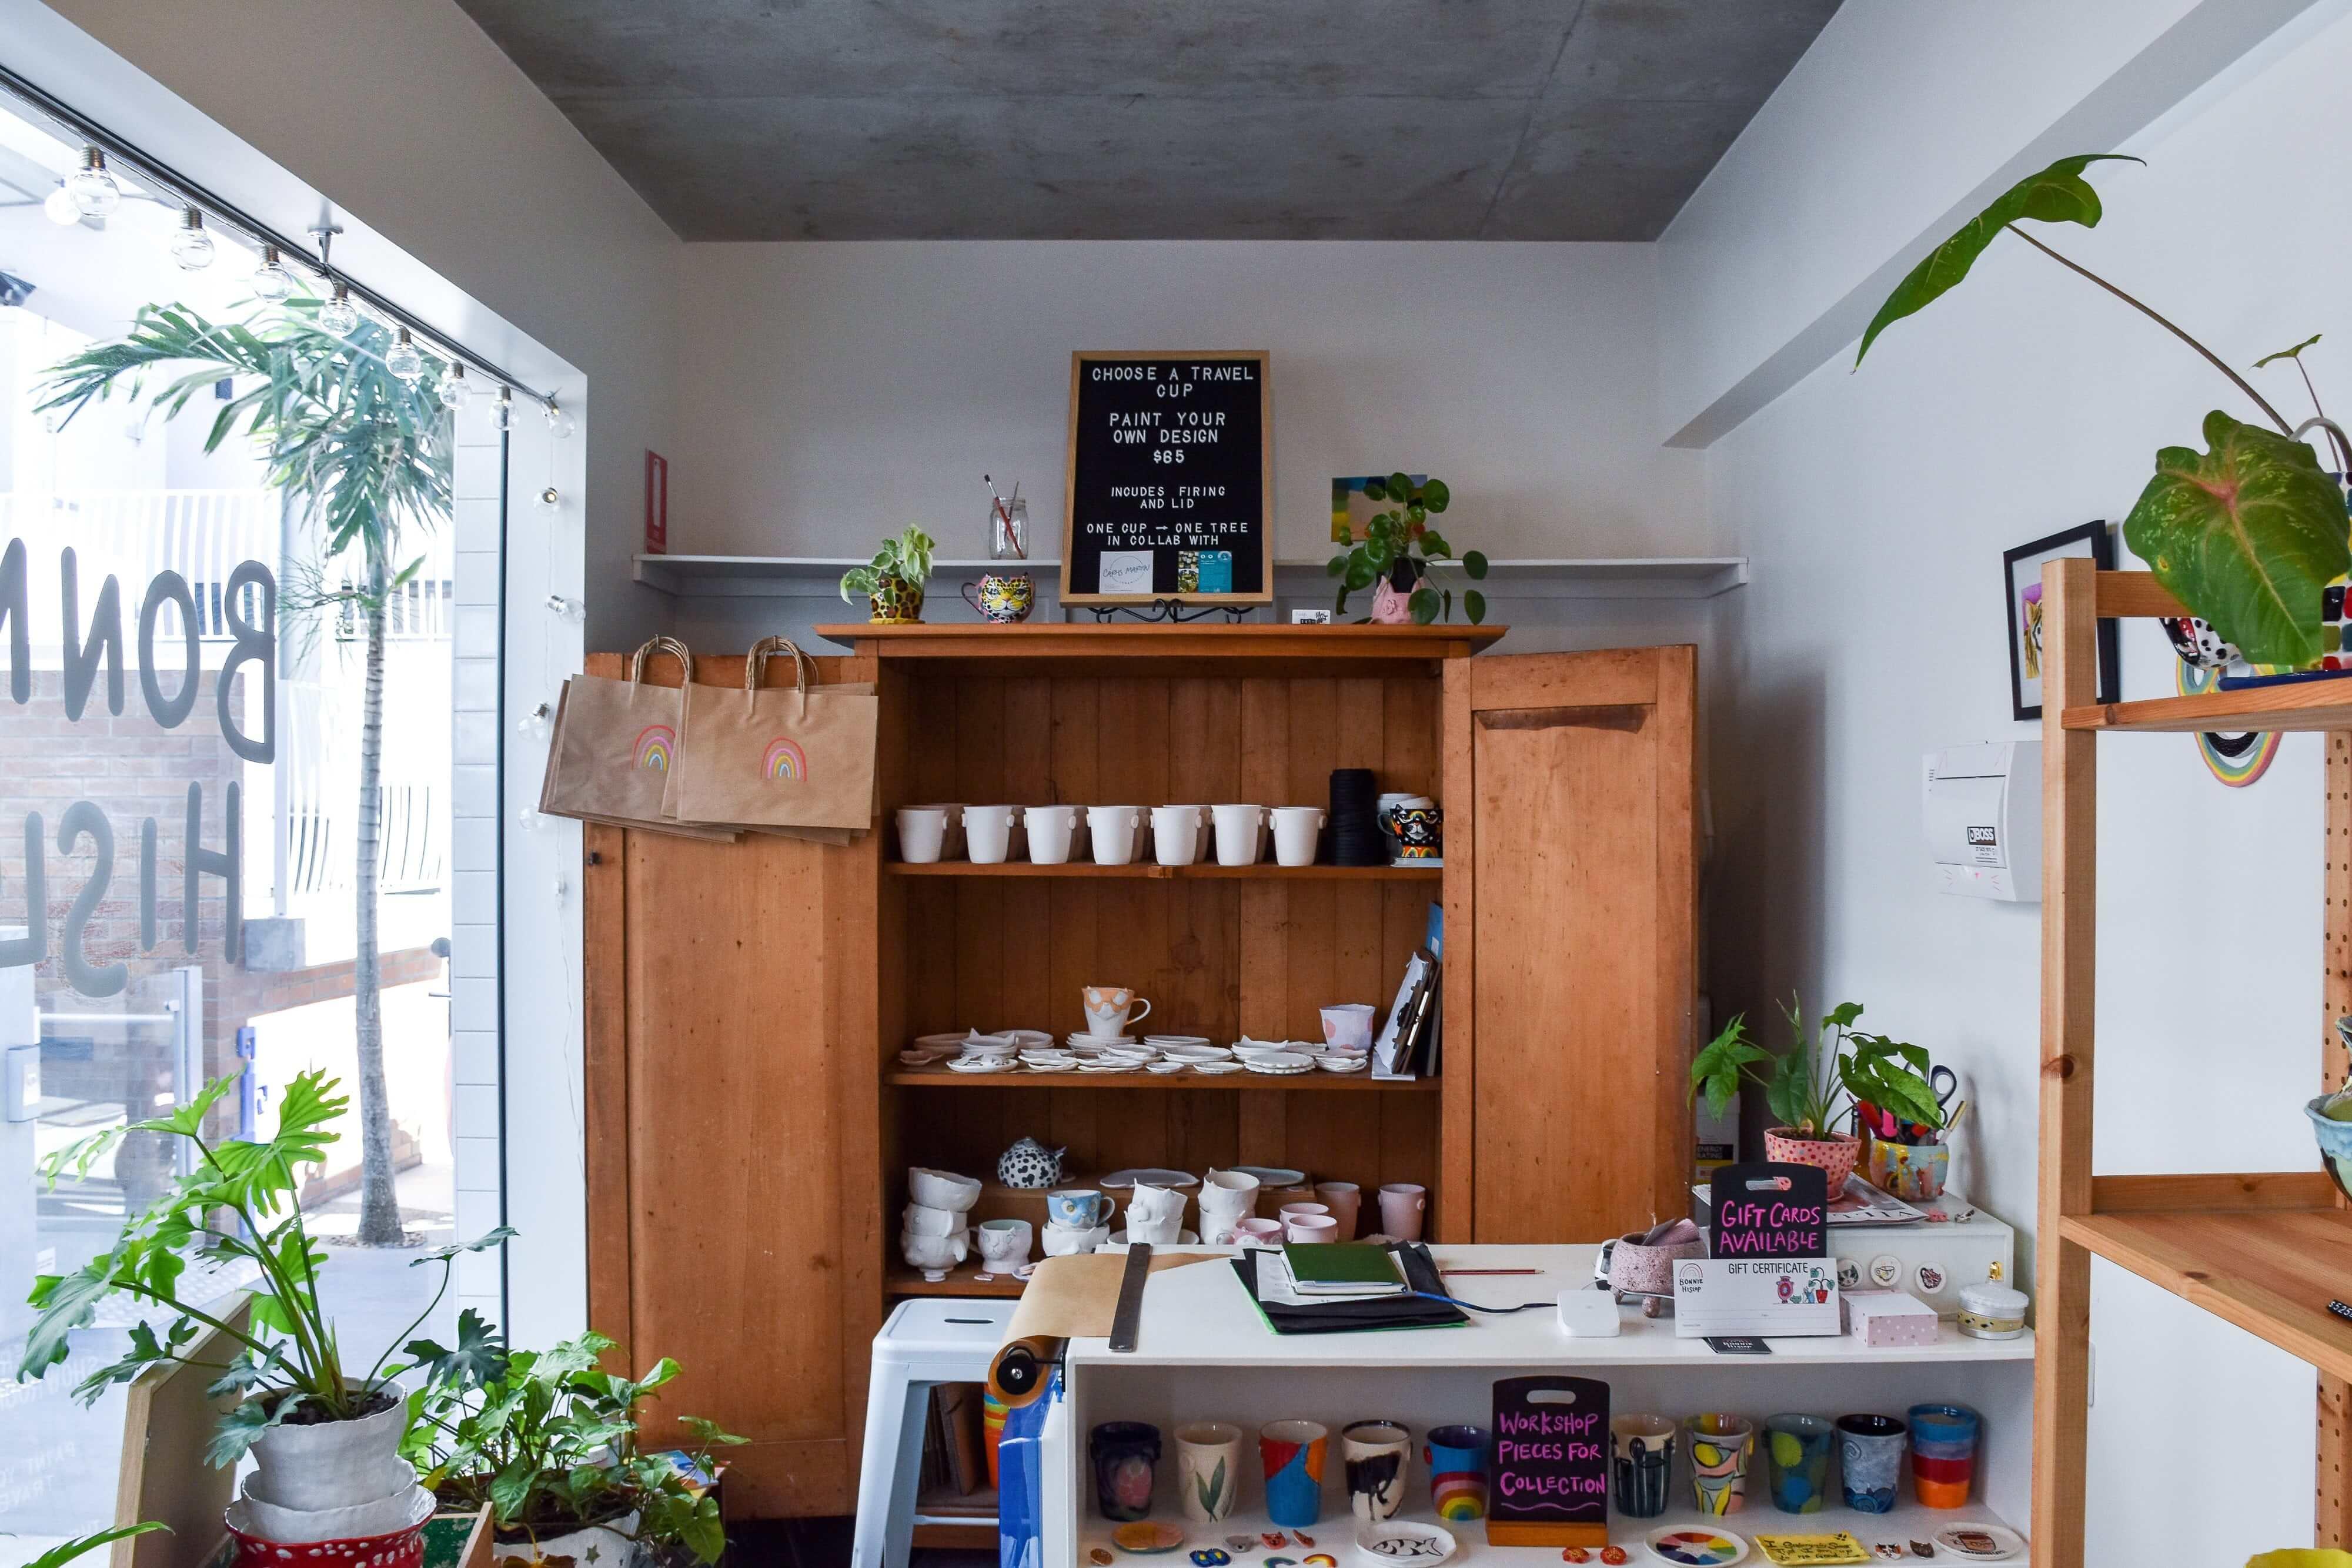 A small business shop built by passionate entrepreneurs